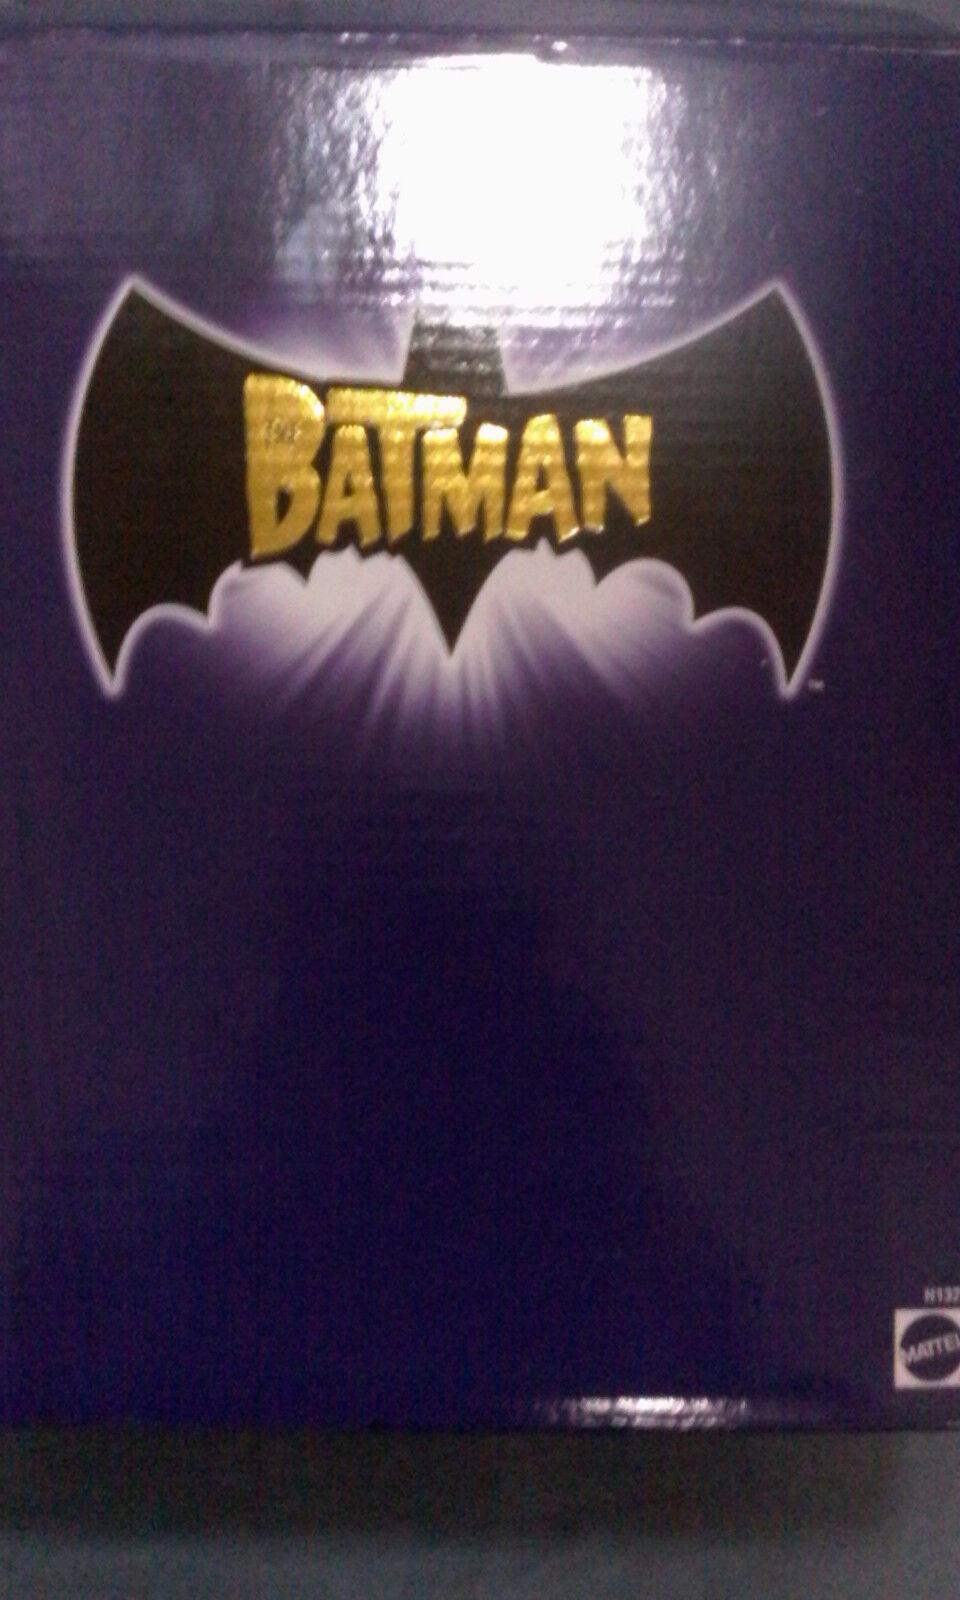 Mattel The Batman Catwoman Catwoman Convention exclusive 2005